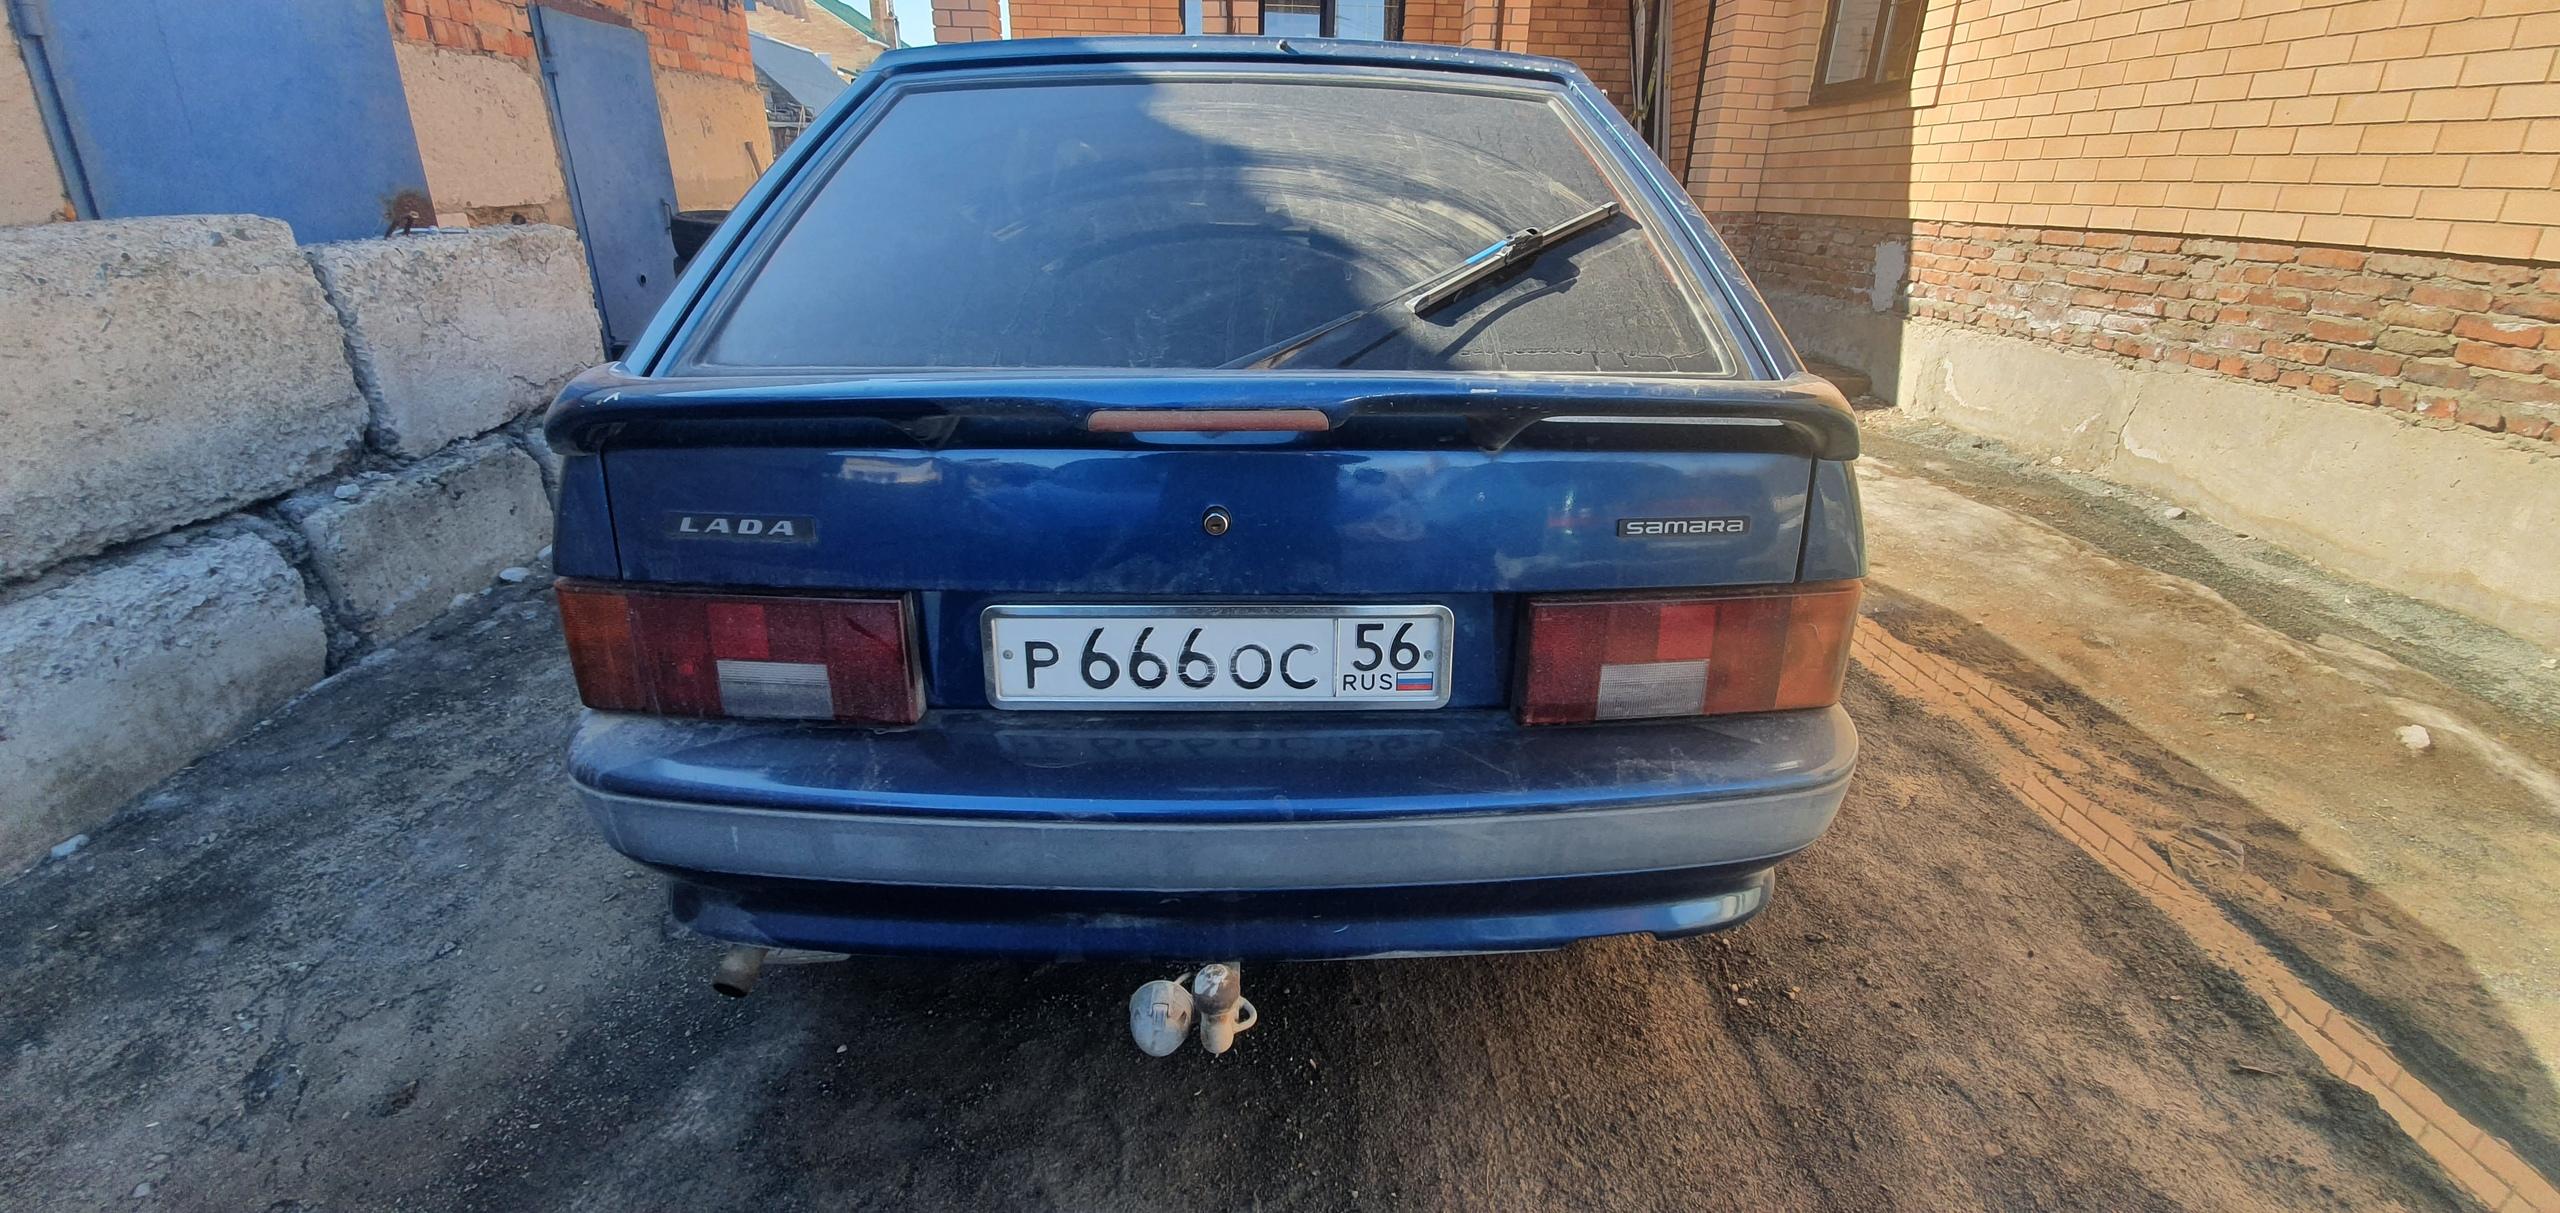 Без ДТП, вся машина в родной краске, без   Объявления Орска и Новотроицка №3190